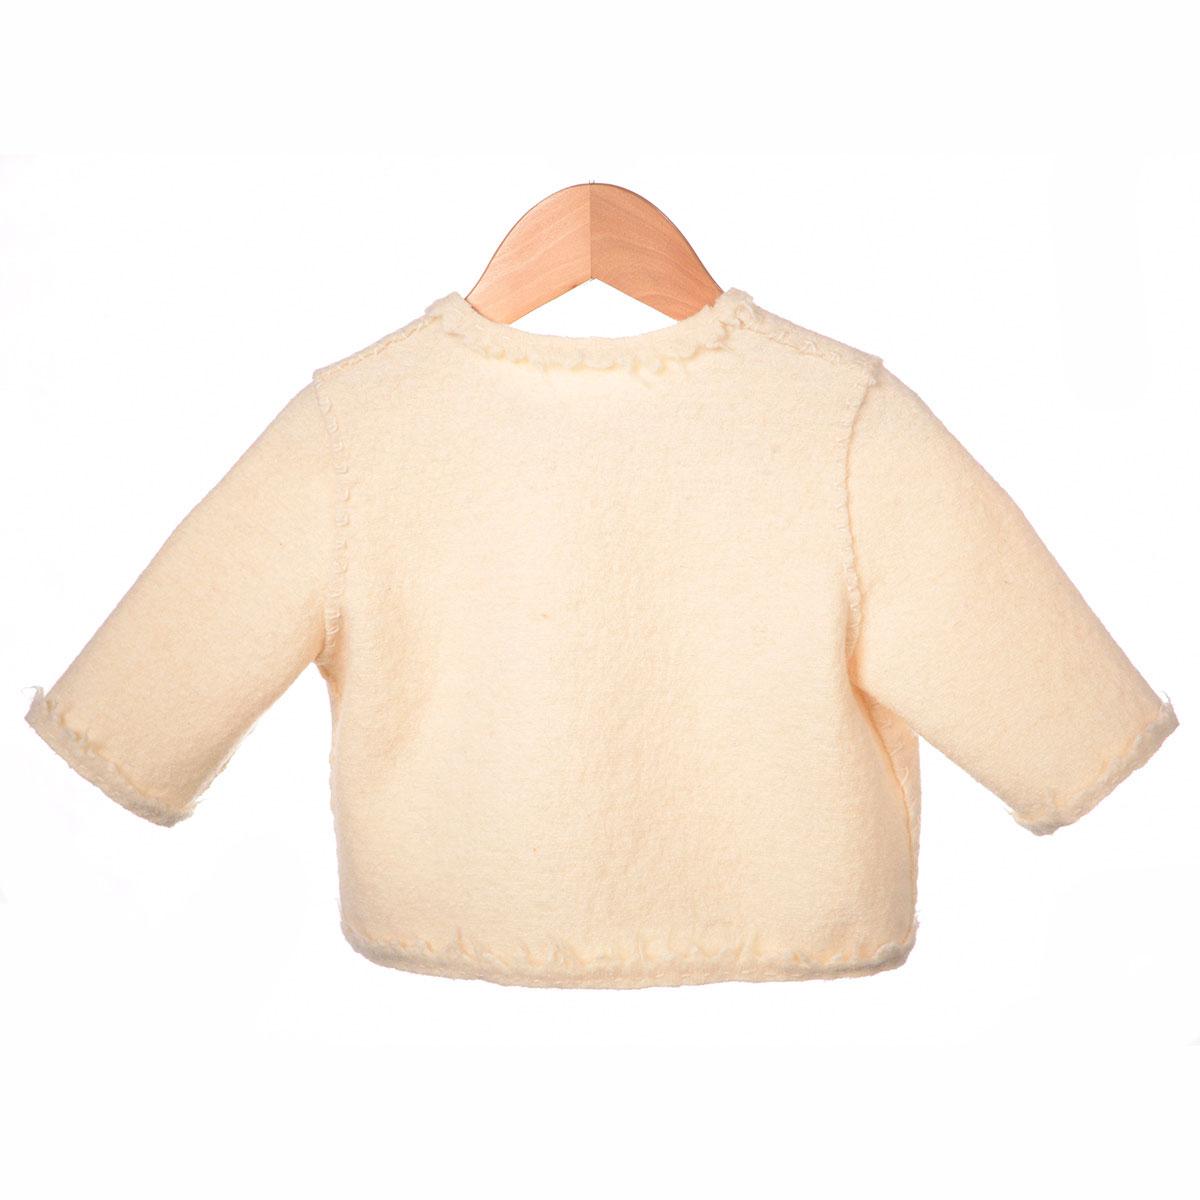 creme wit jasje, bloem borduursel achterzijde